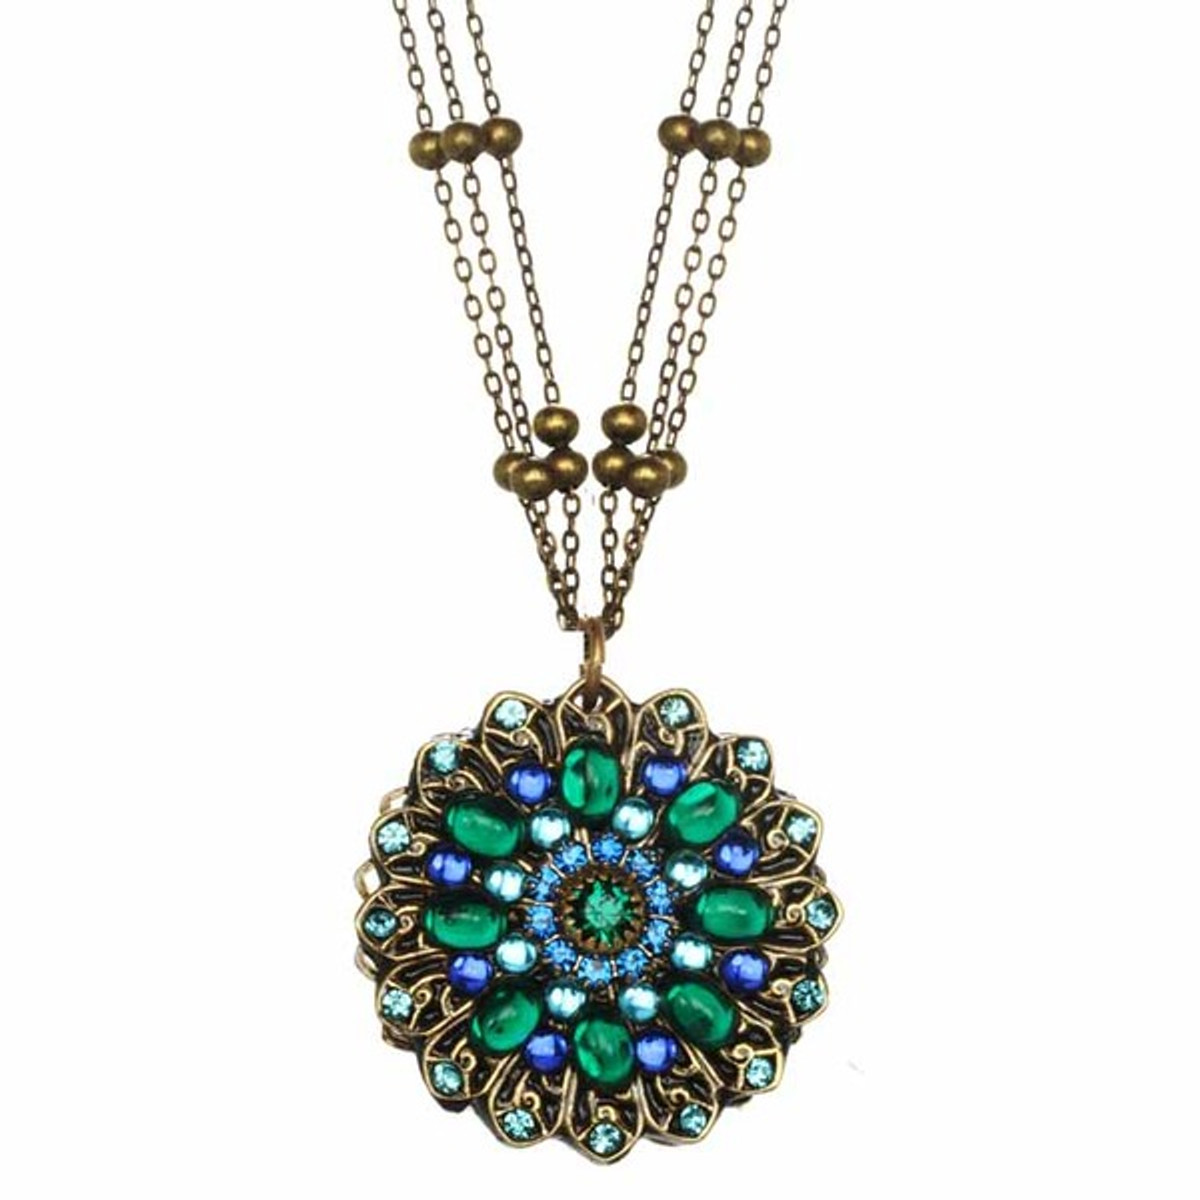 Golan Jewelry Peacock Necklaces